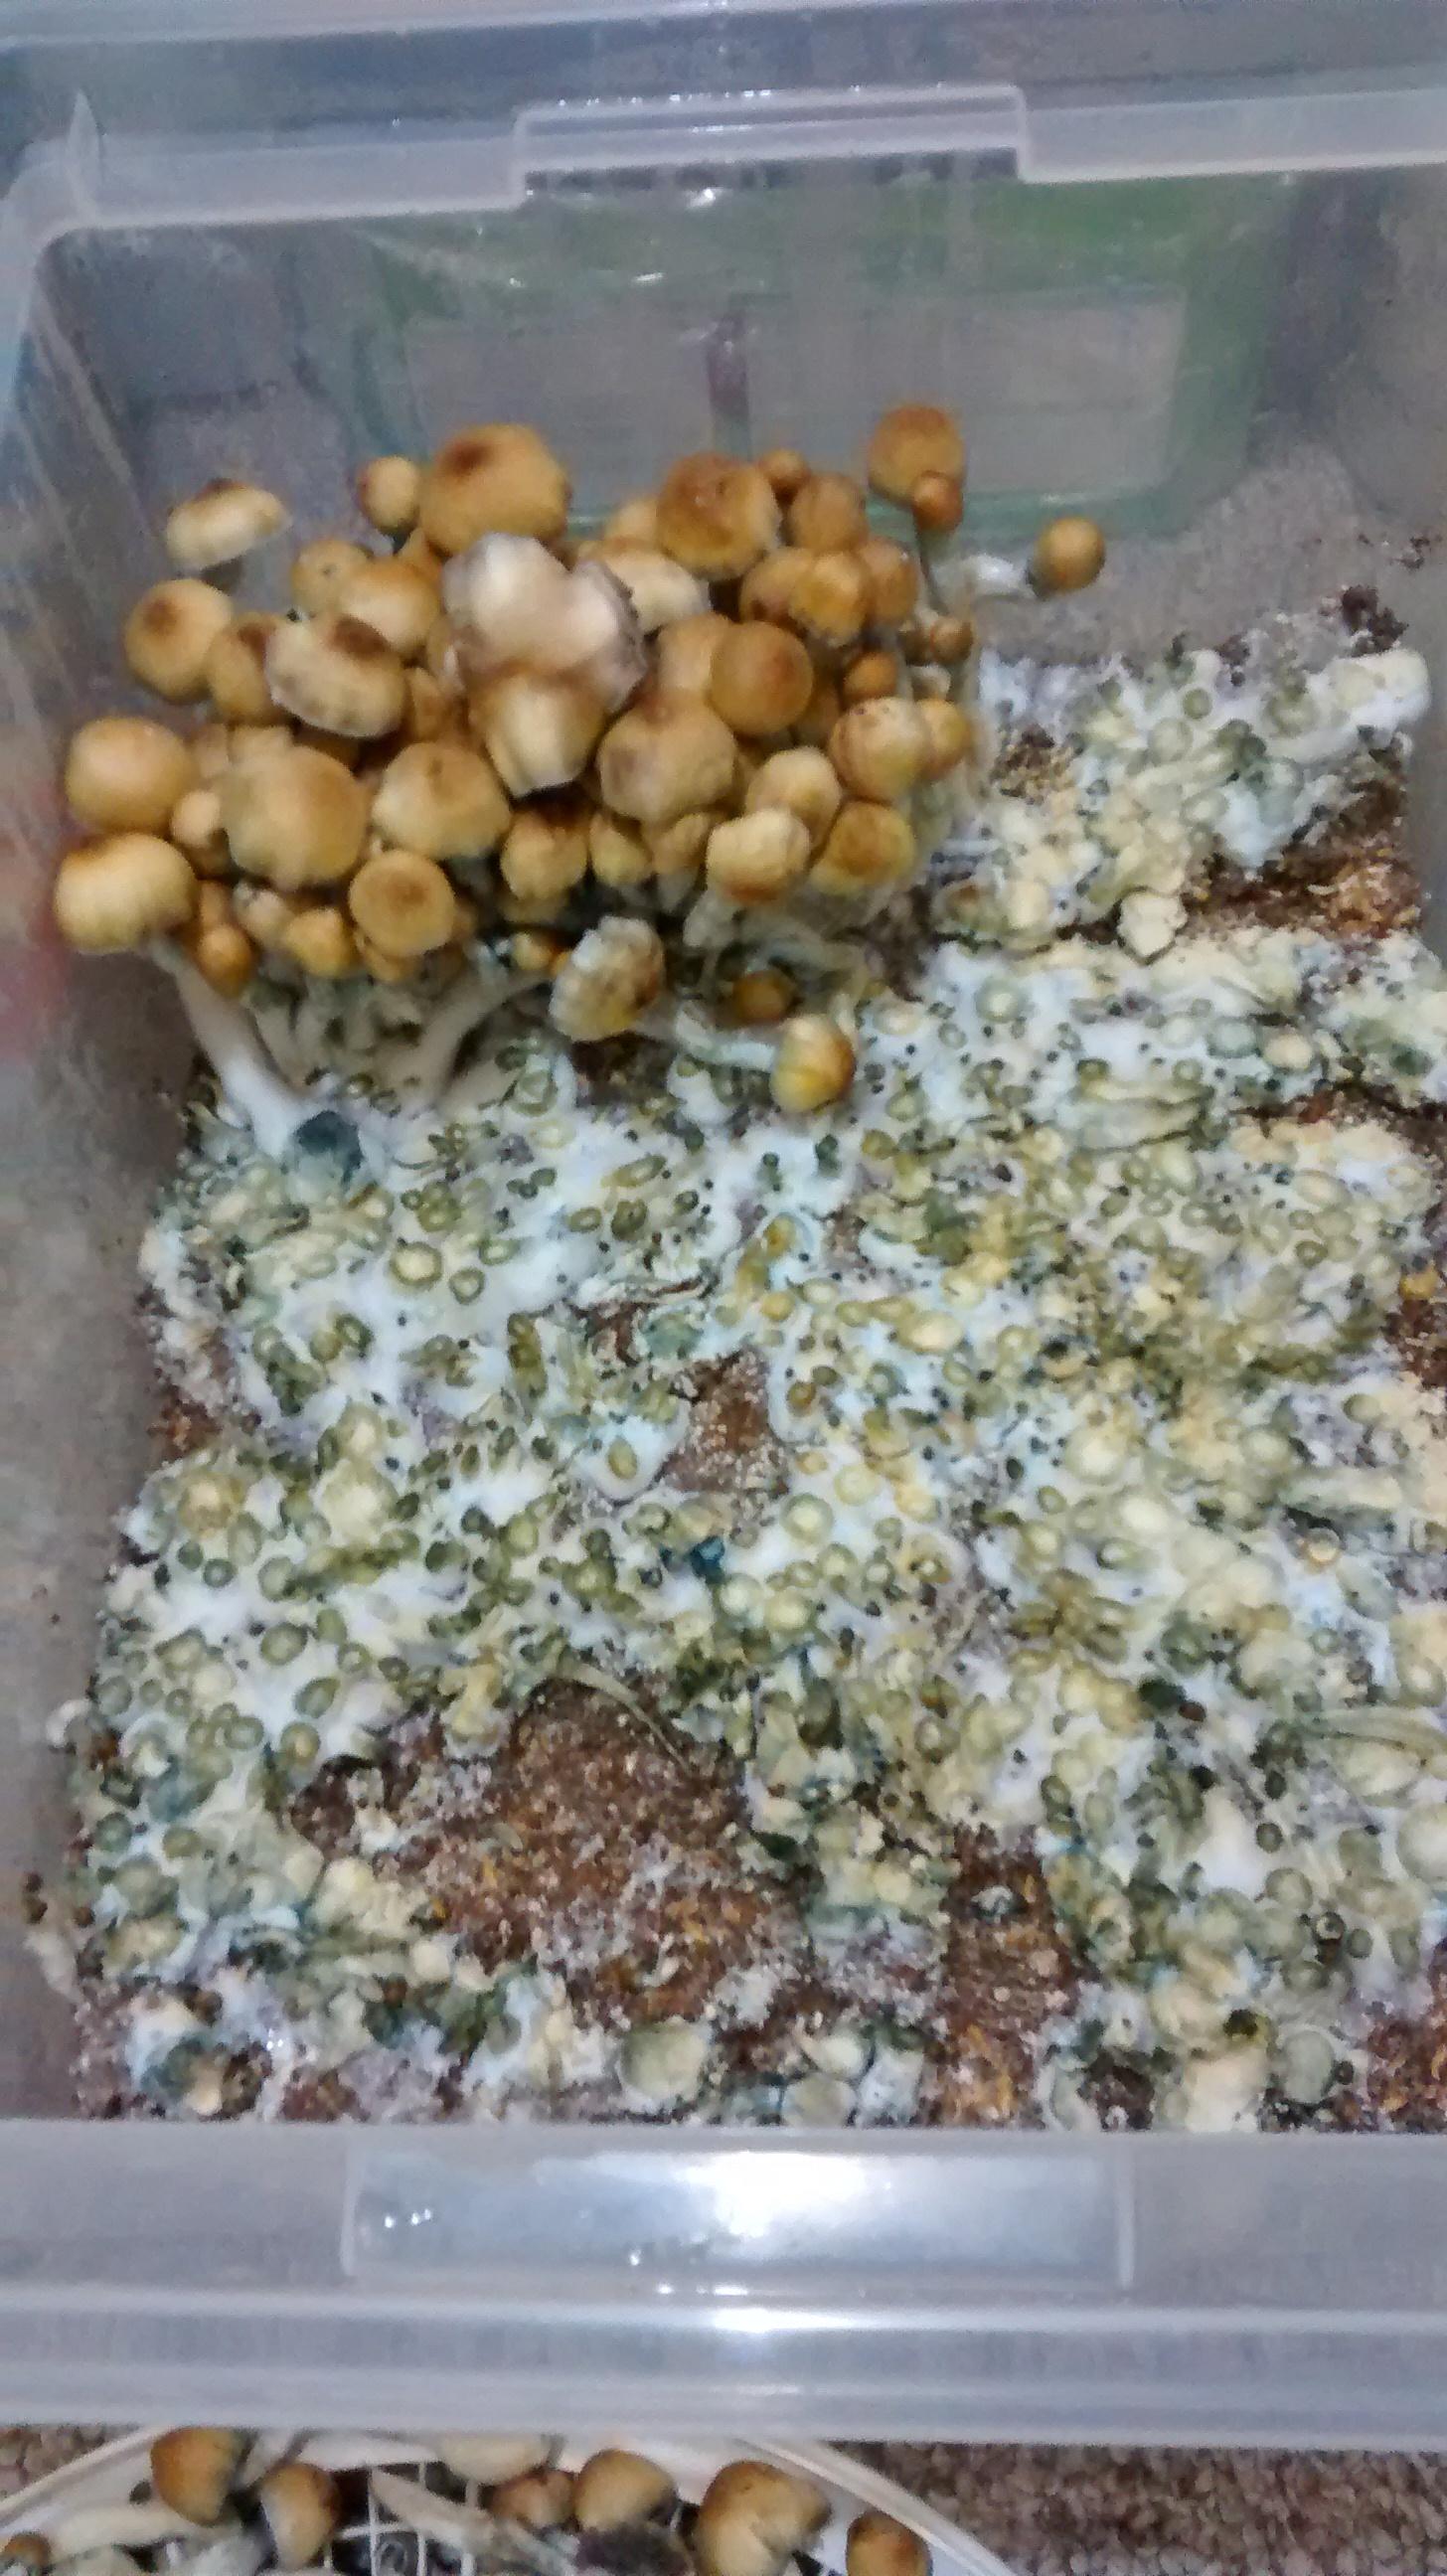 Using Michigan Peat Garden Magic Compost and Manure for bulk